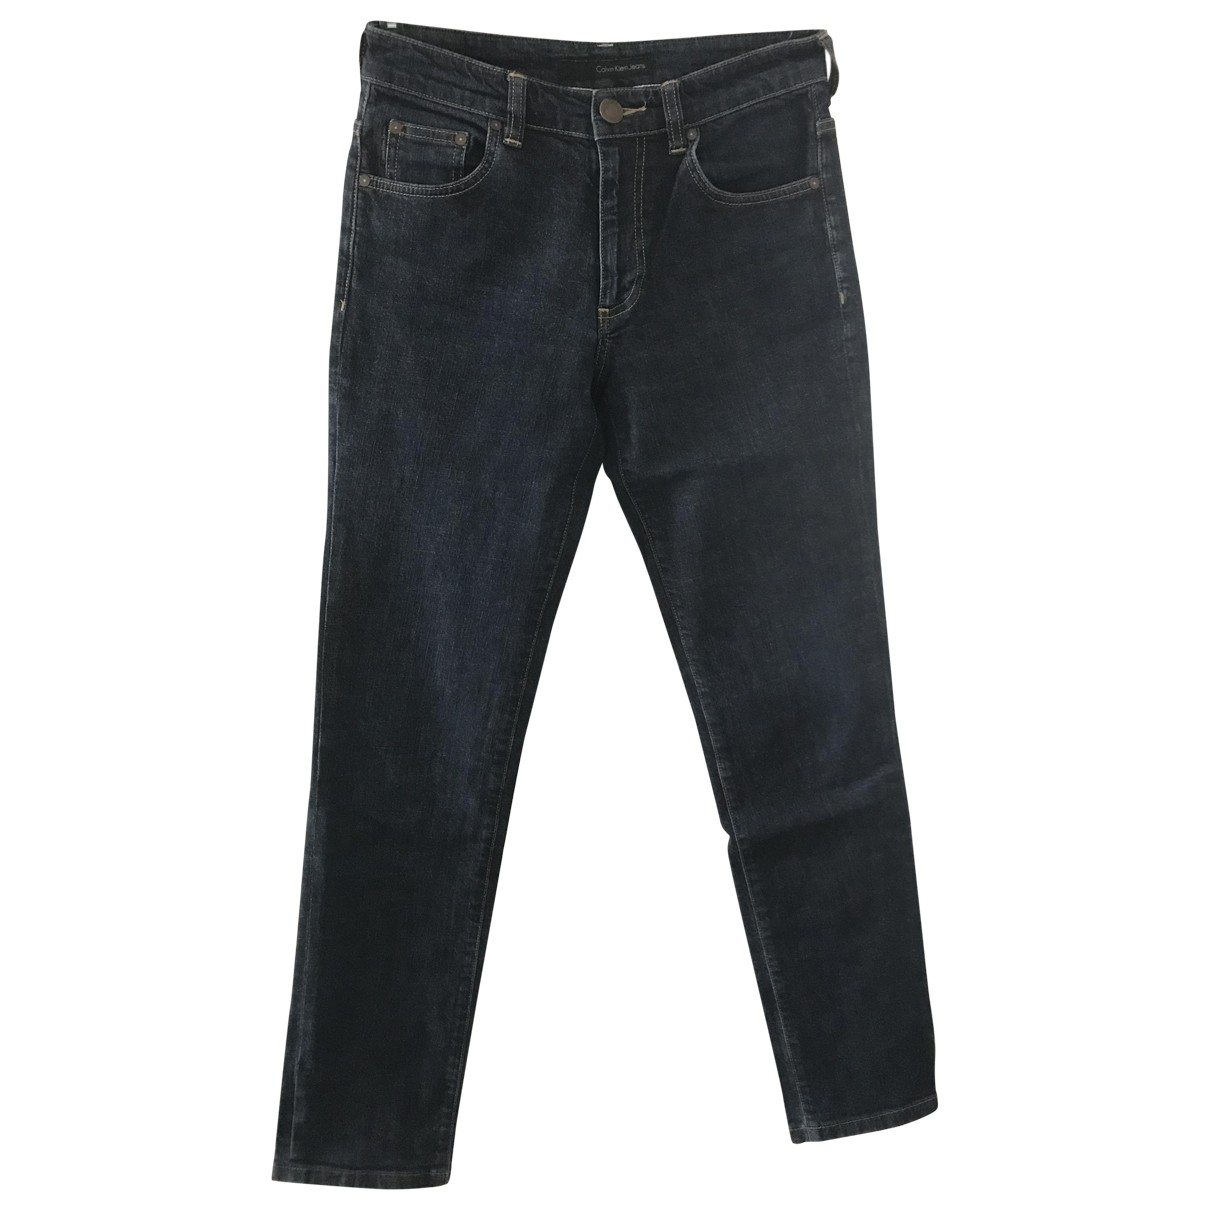 Calvin Klein \N Navy Cotton - elasthane Jeans for Women 28 US